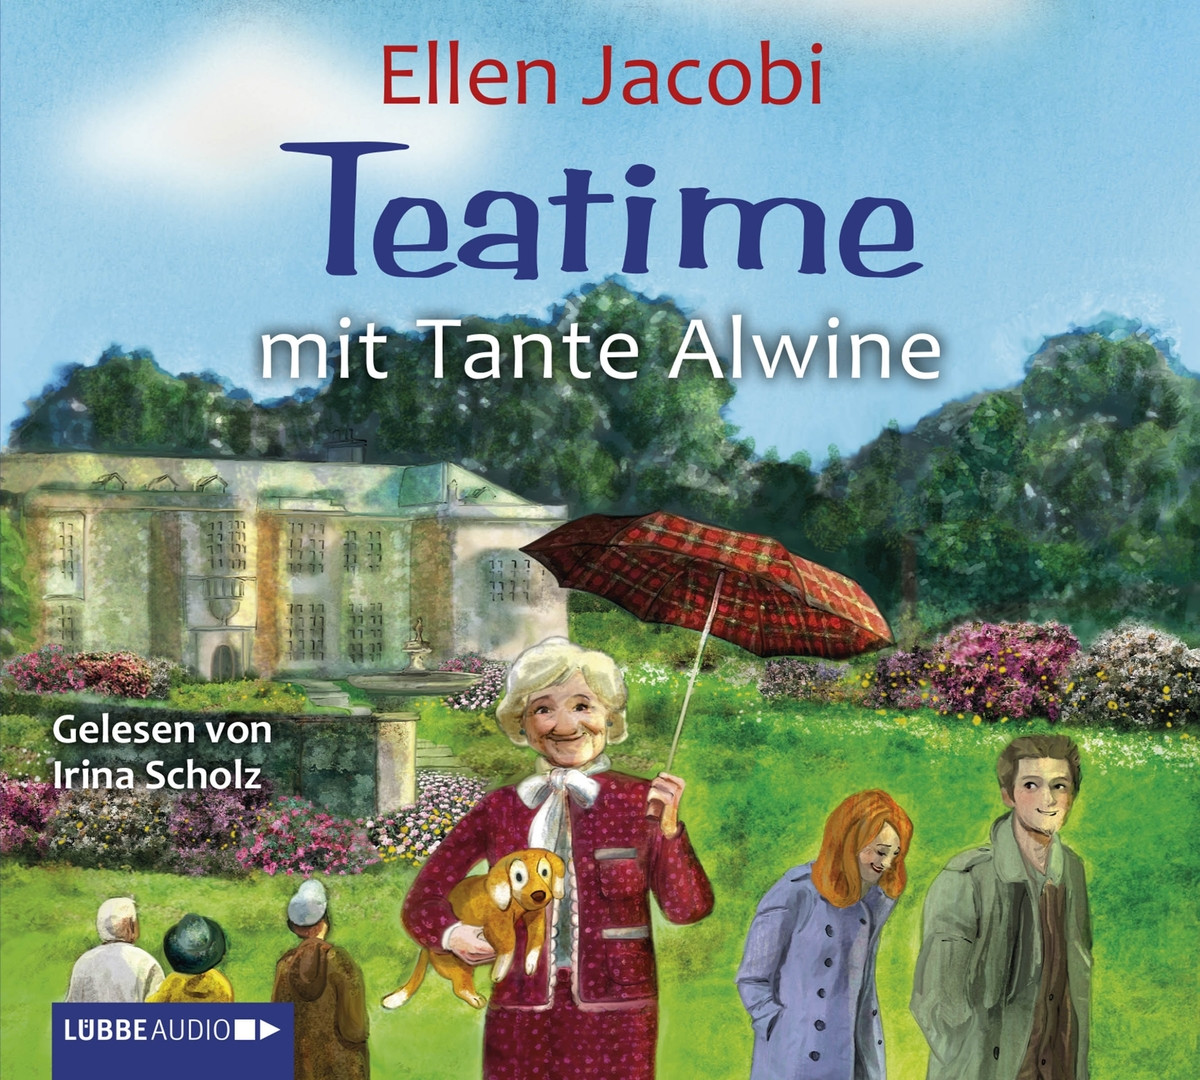 Ellen Jacobi - Teatime mit Tante Alwine